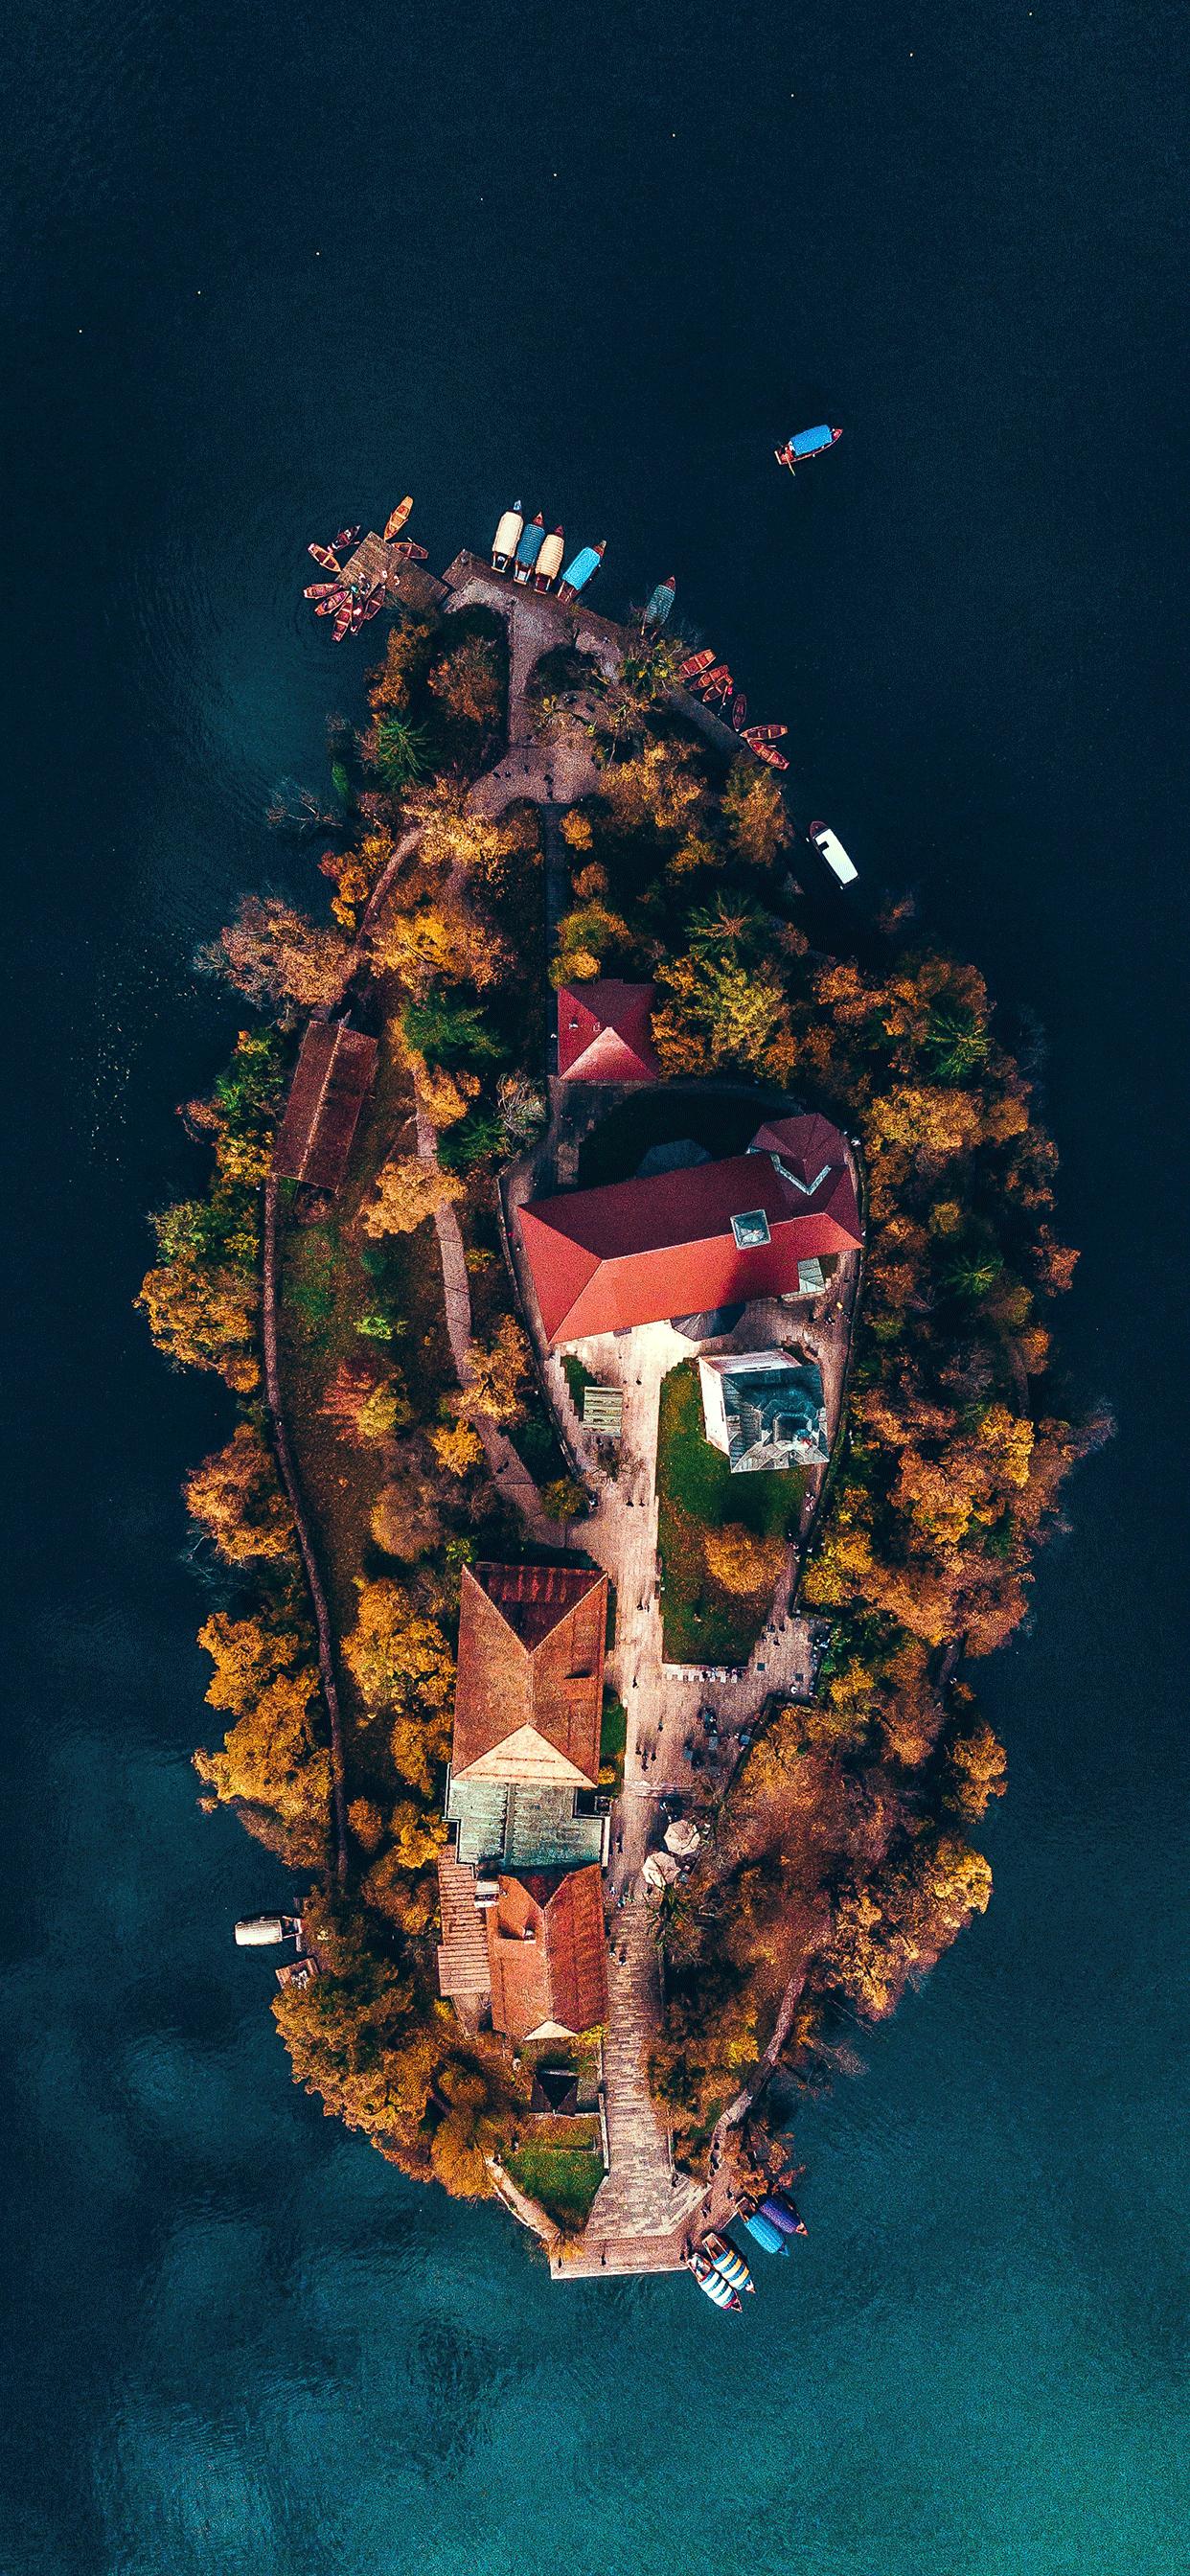 iPhone wallpapers island slovenia Island